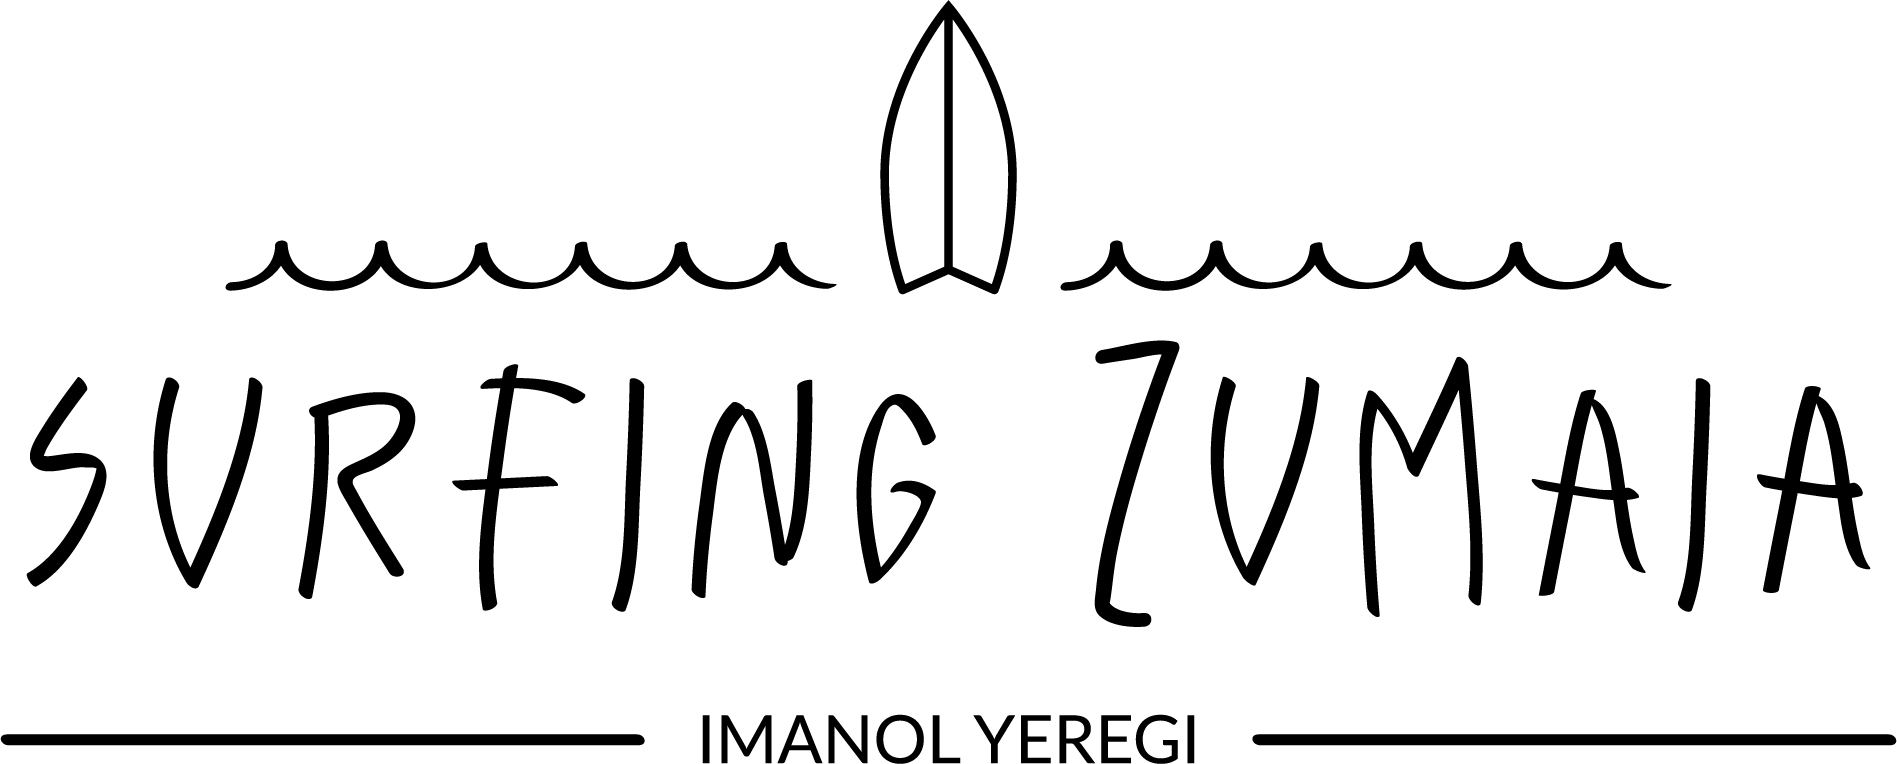 Surfing Zumaia